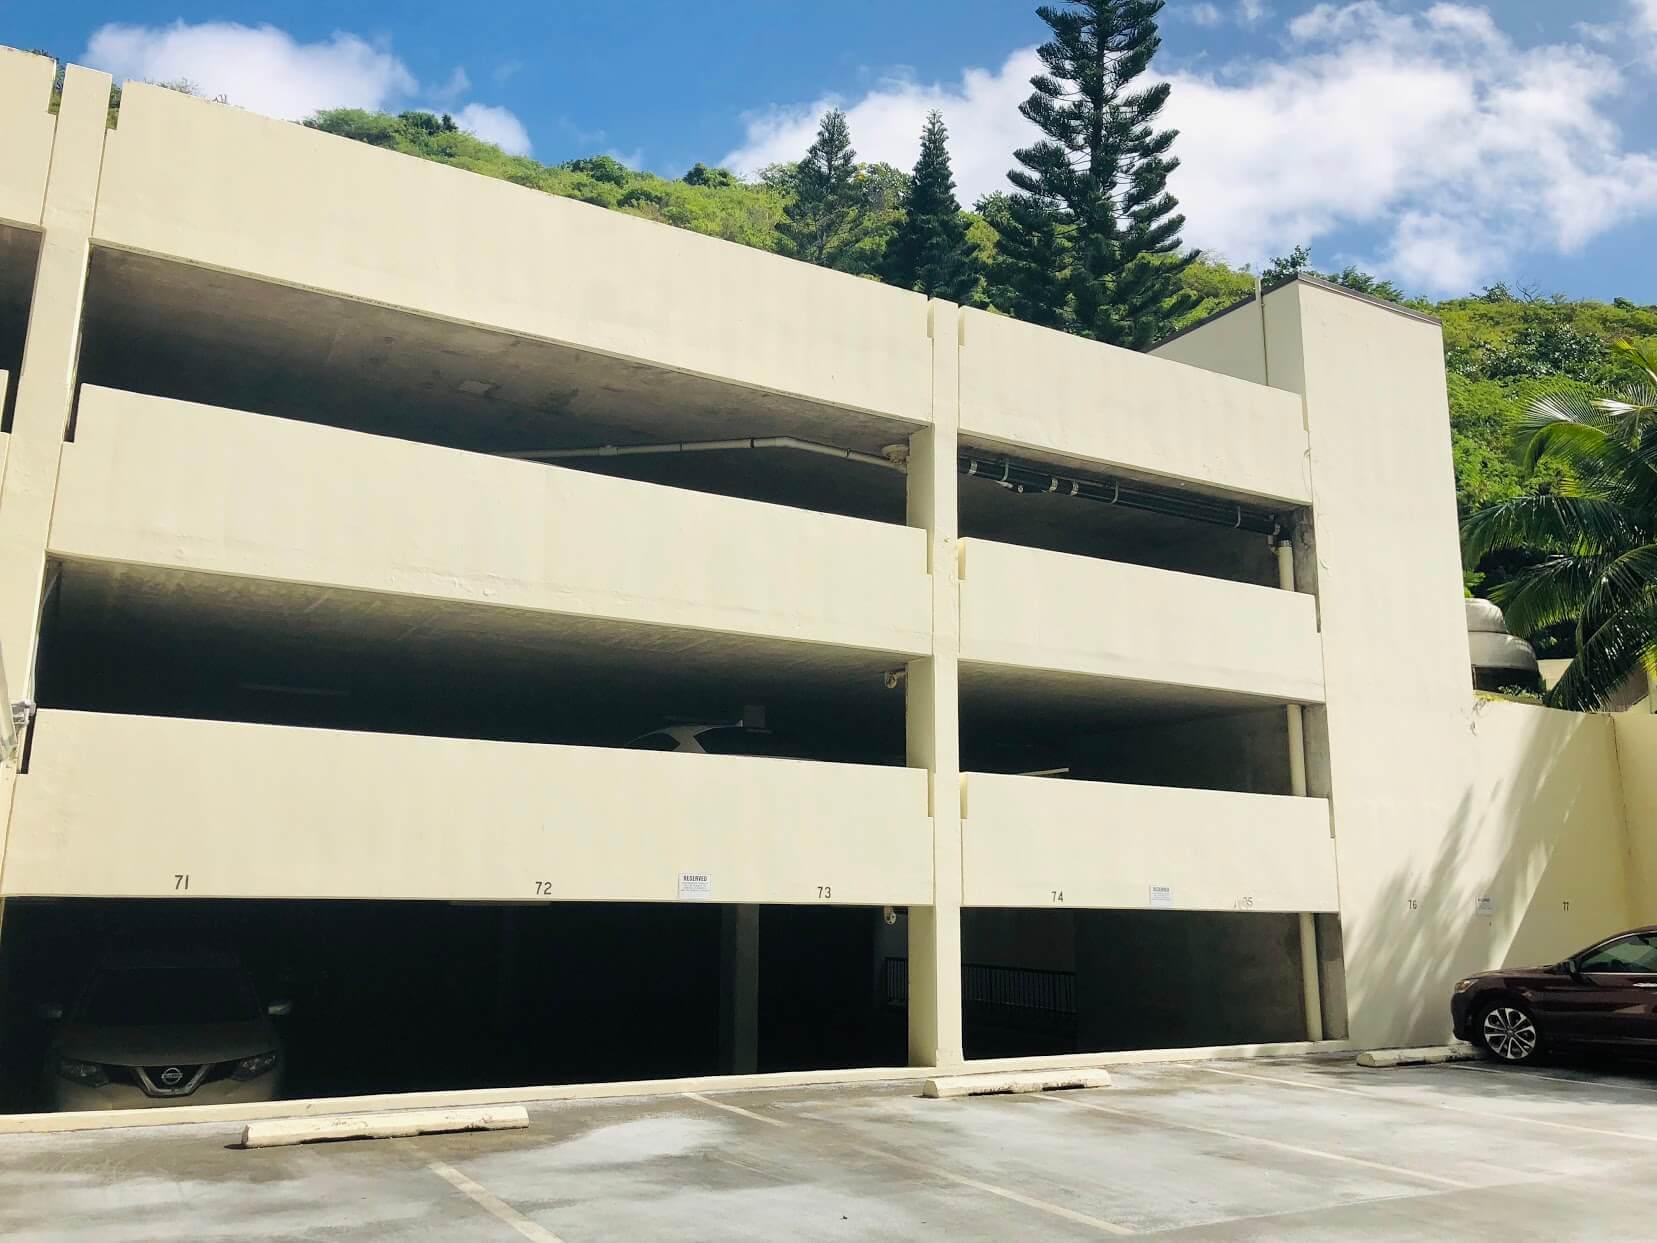 Naniwa Gardensの駐車場